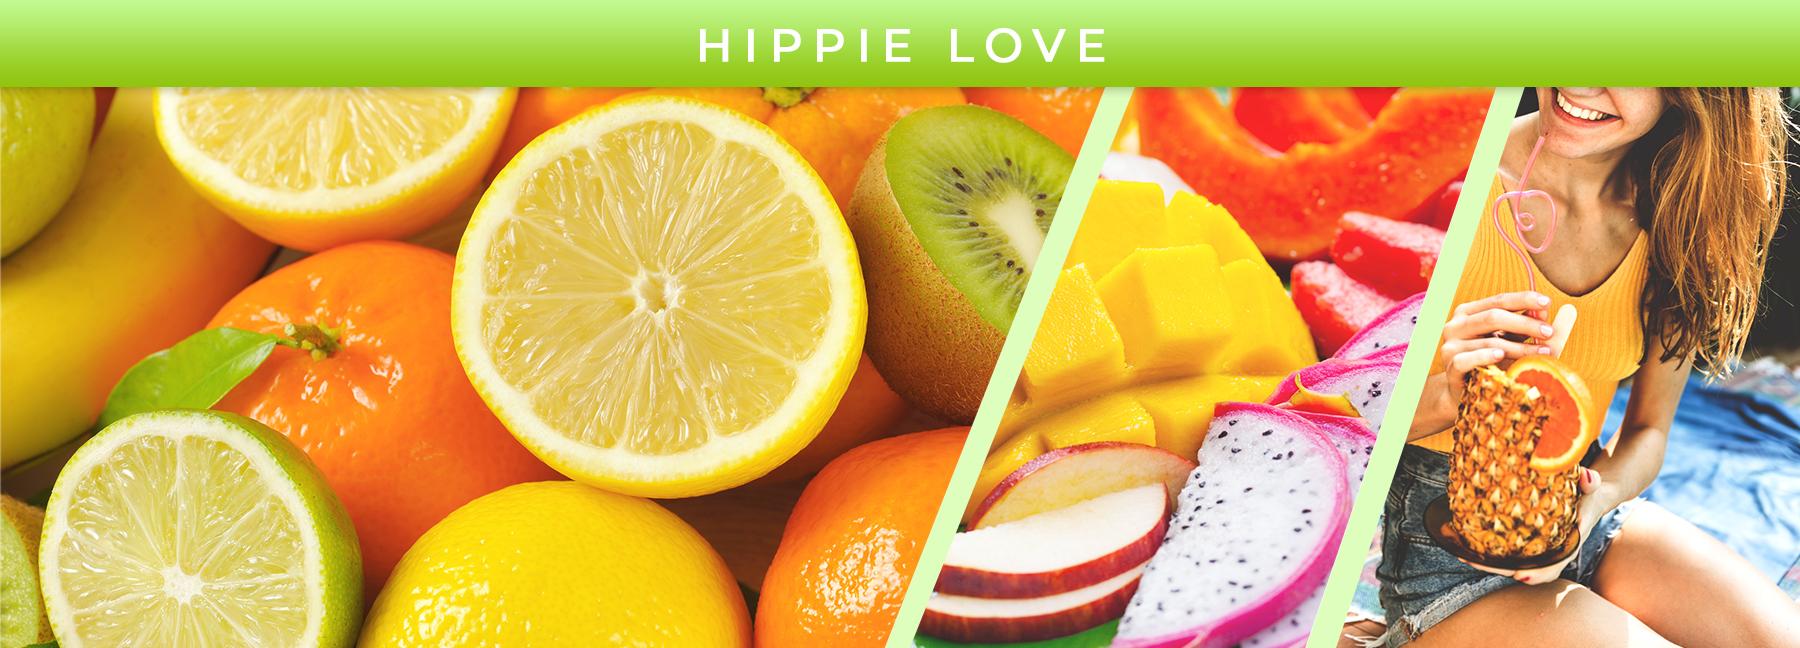 Hippie Love fragrance elements